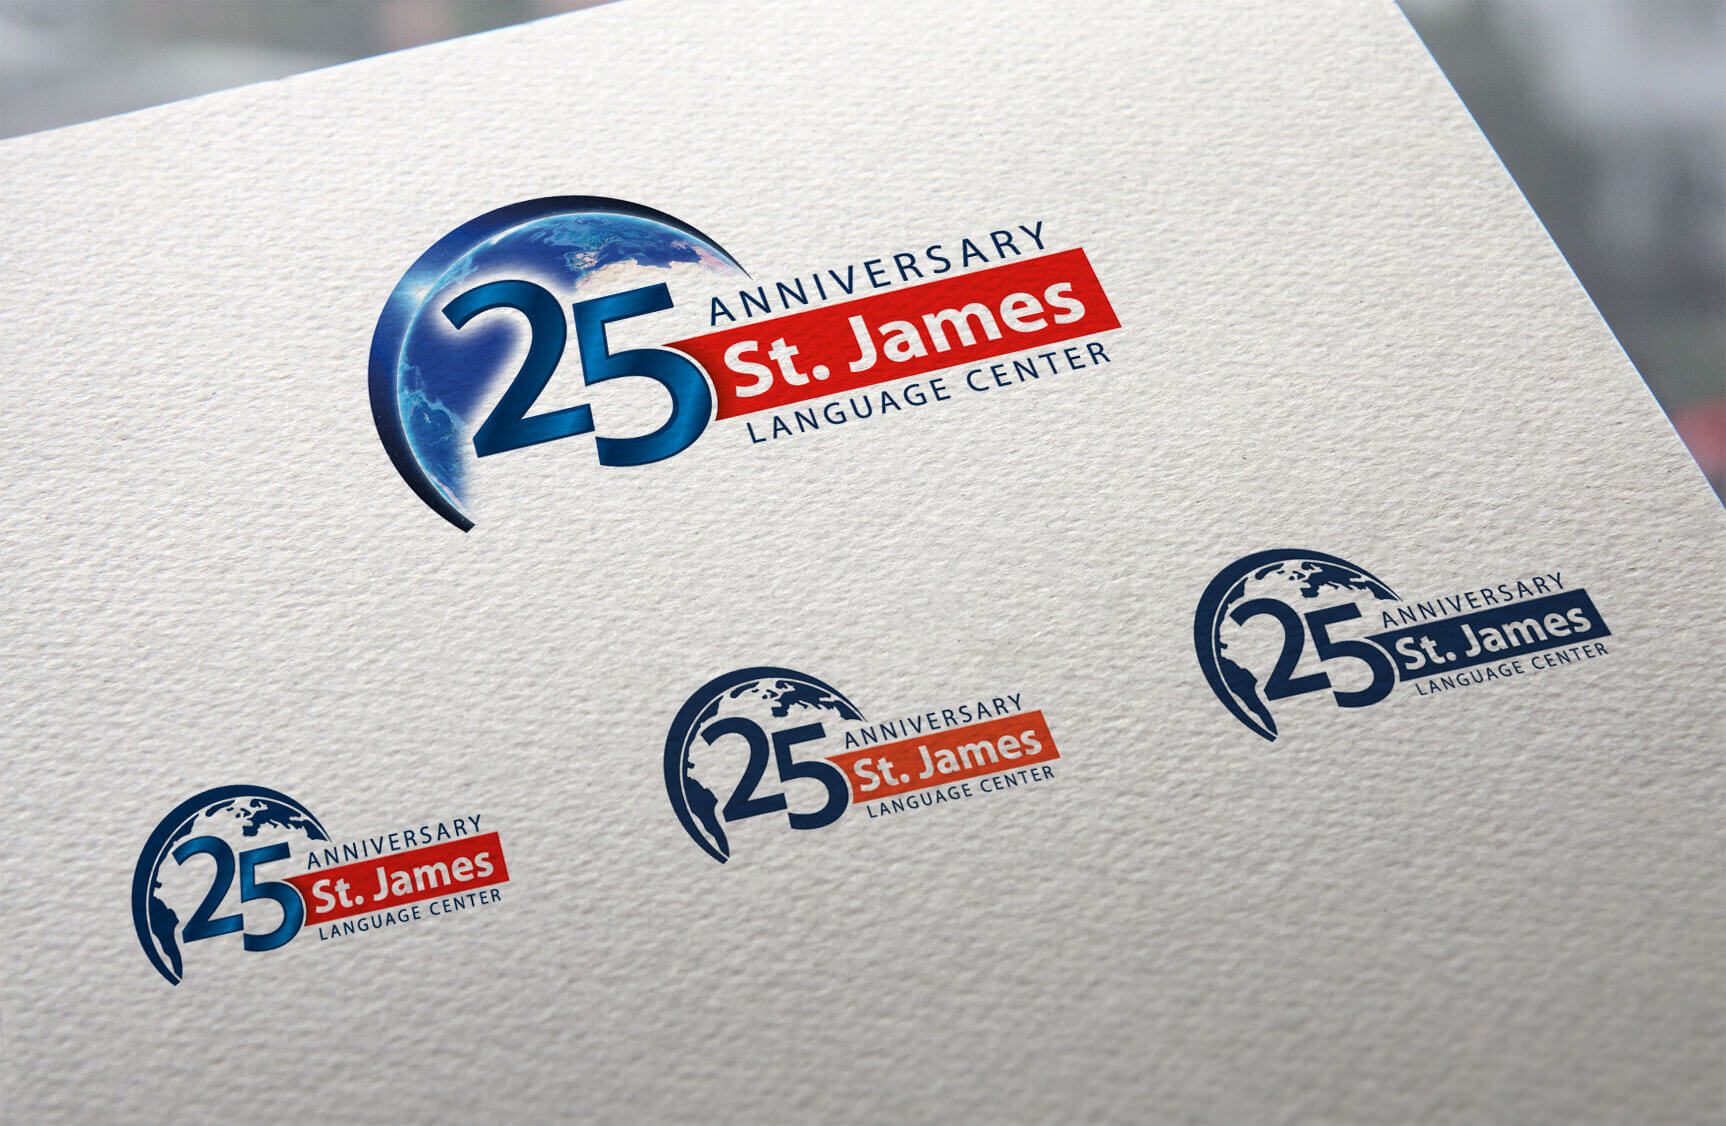 St James 25 anniversary - Logotipos